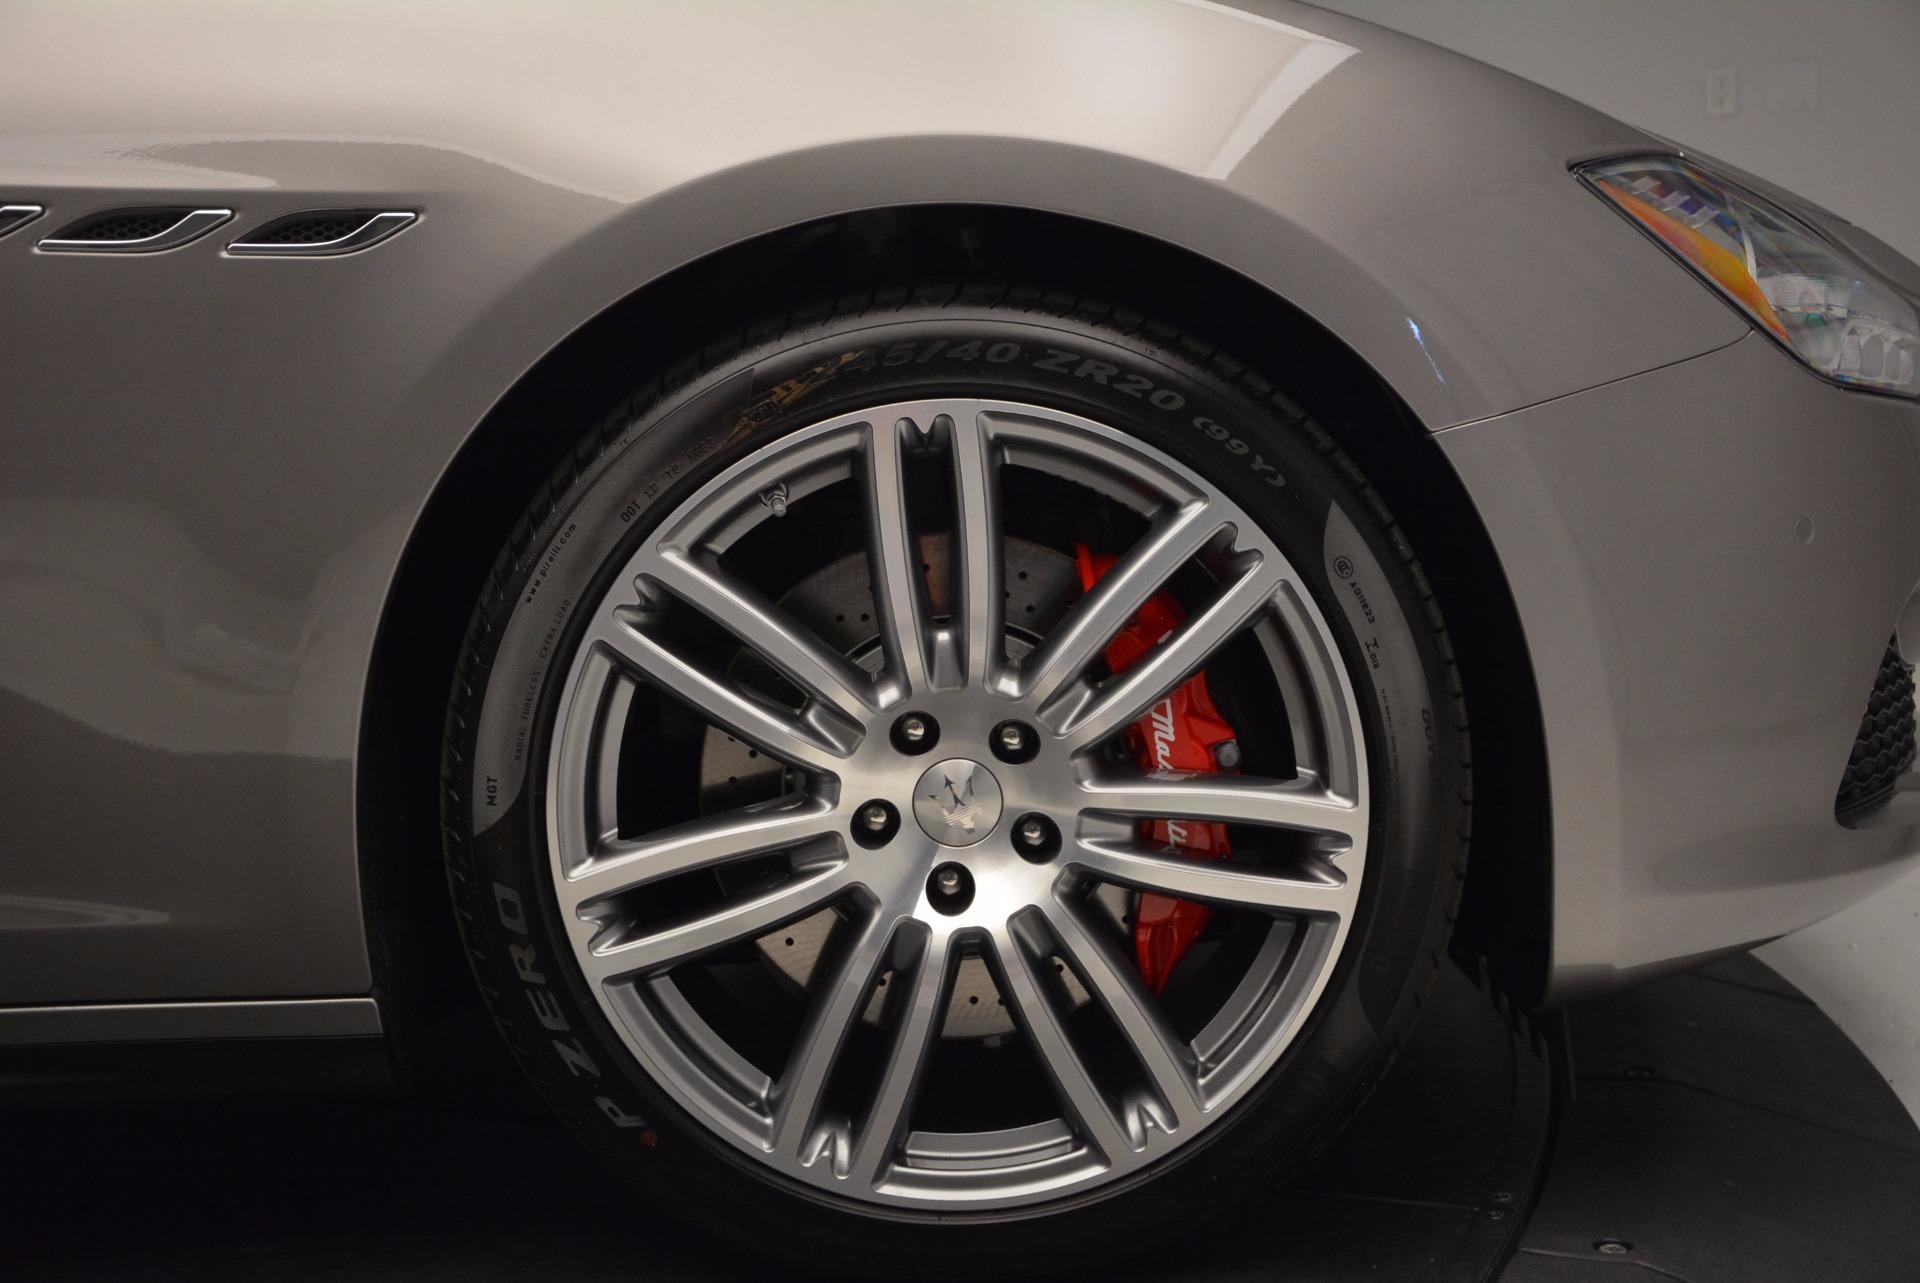 Used 2015 Maserati Ghibli S Q4 For Sale In Westport, CT 1290_p26